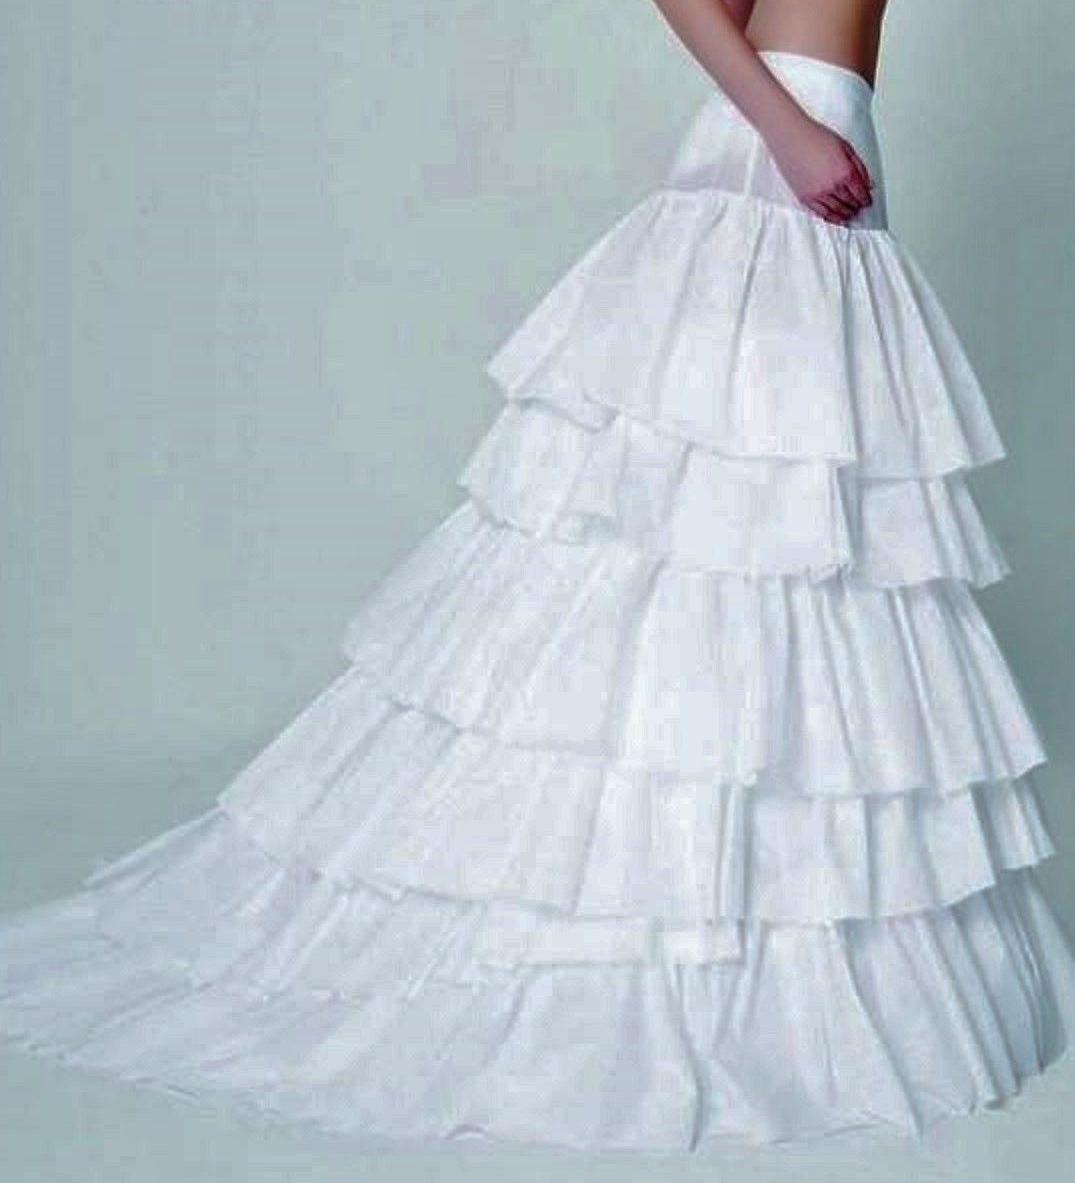 El cancán de novia / Wedding petticoats | mil dedales